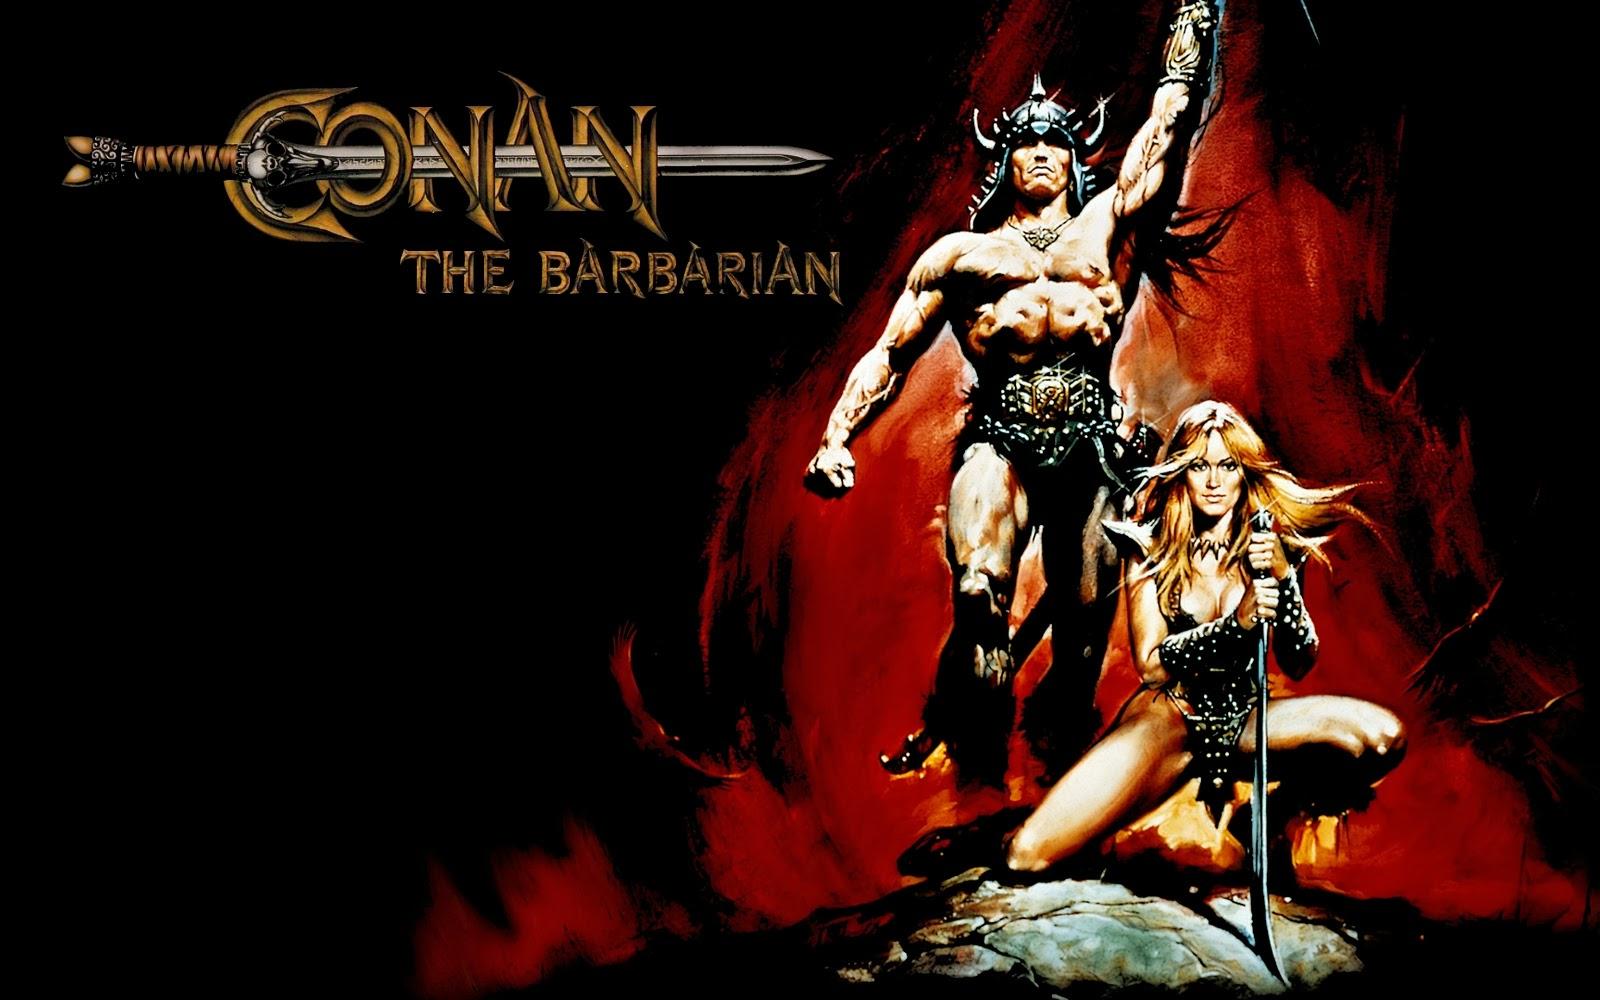 Conan the Barbarian Wallpaper 1600x1000